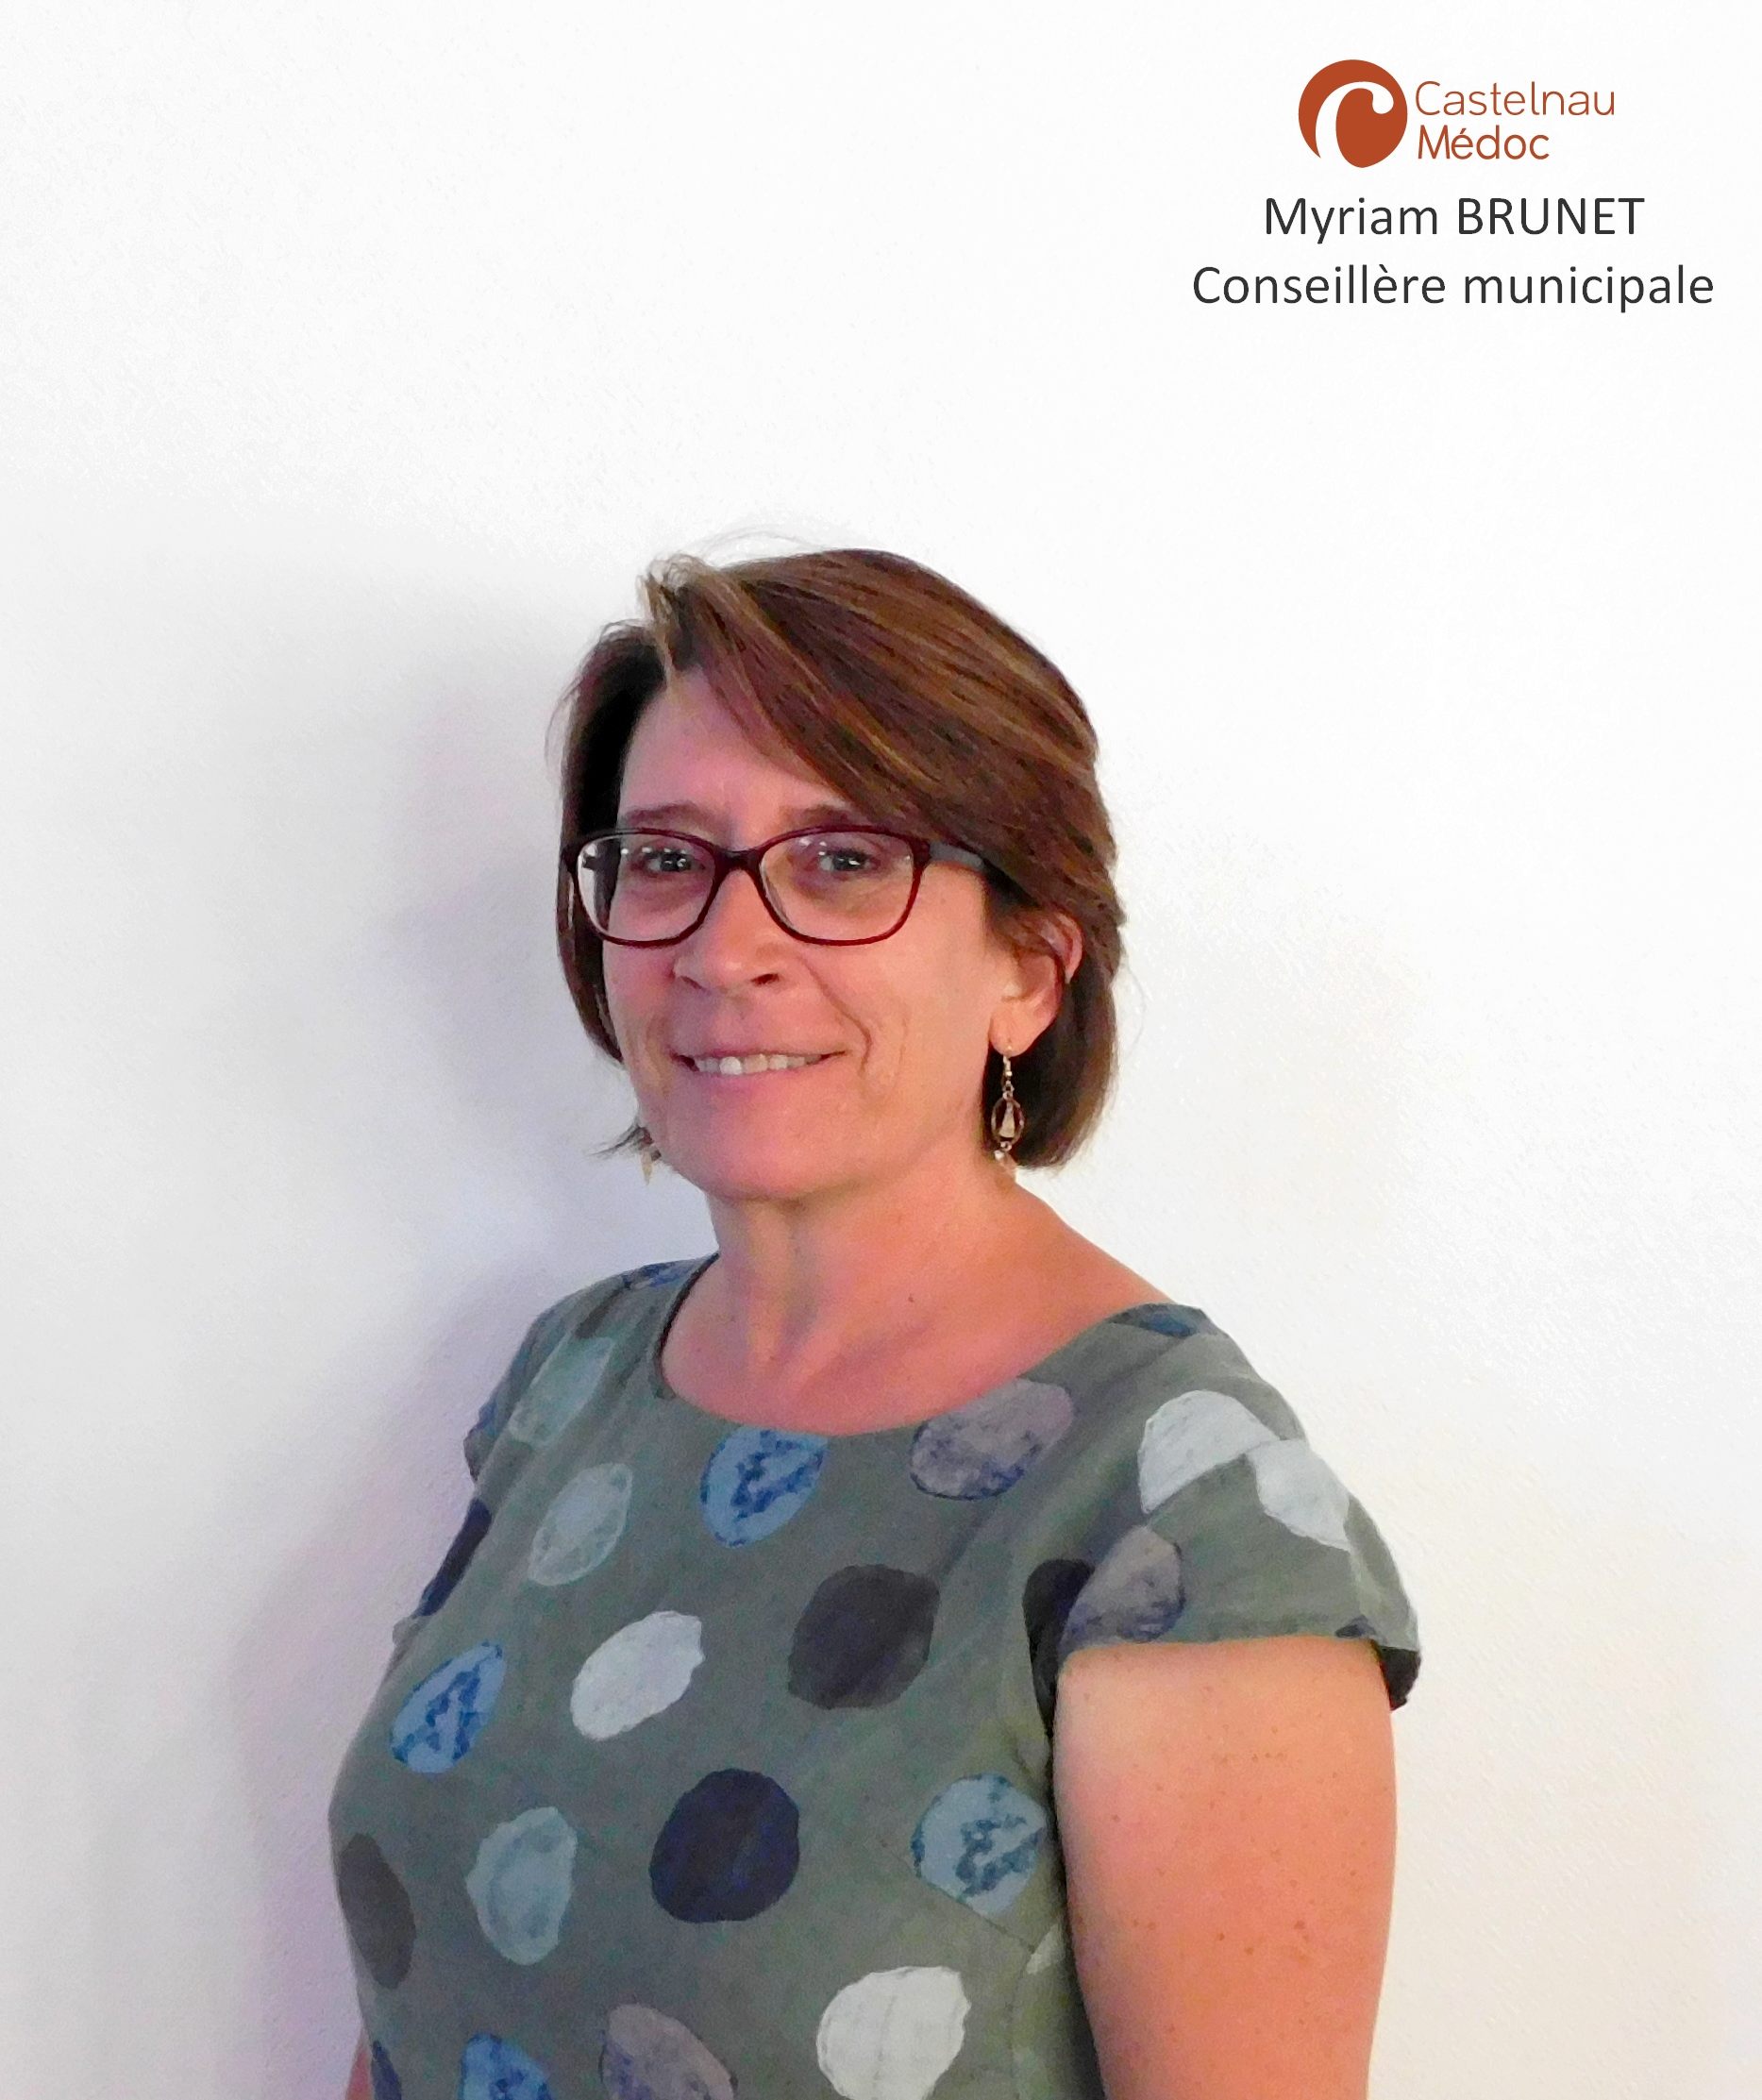 Myriam BRUNET